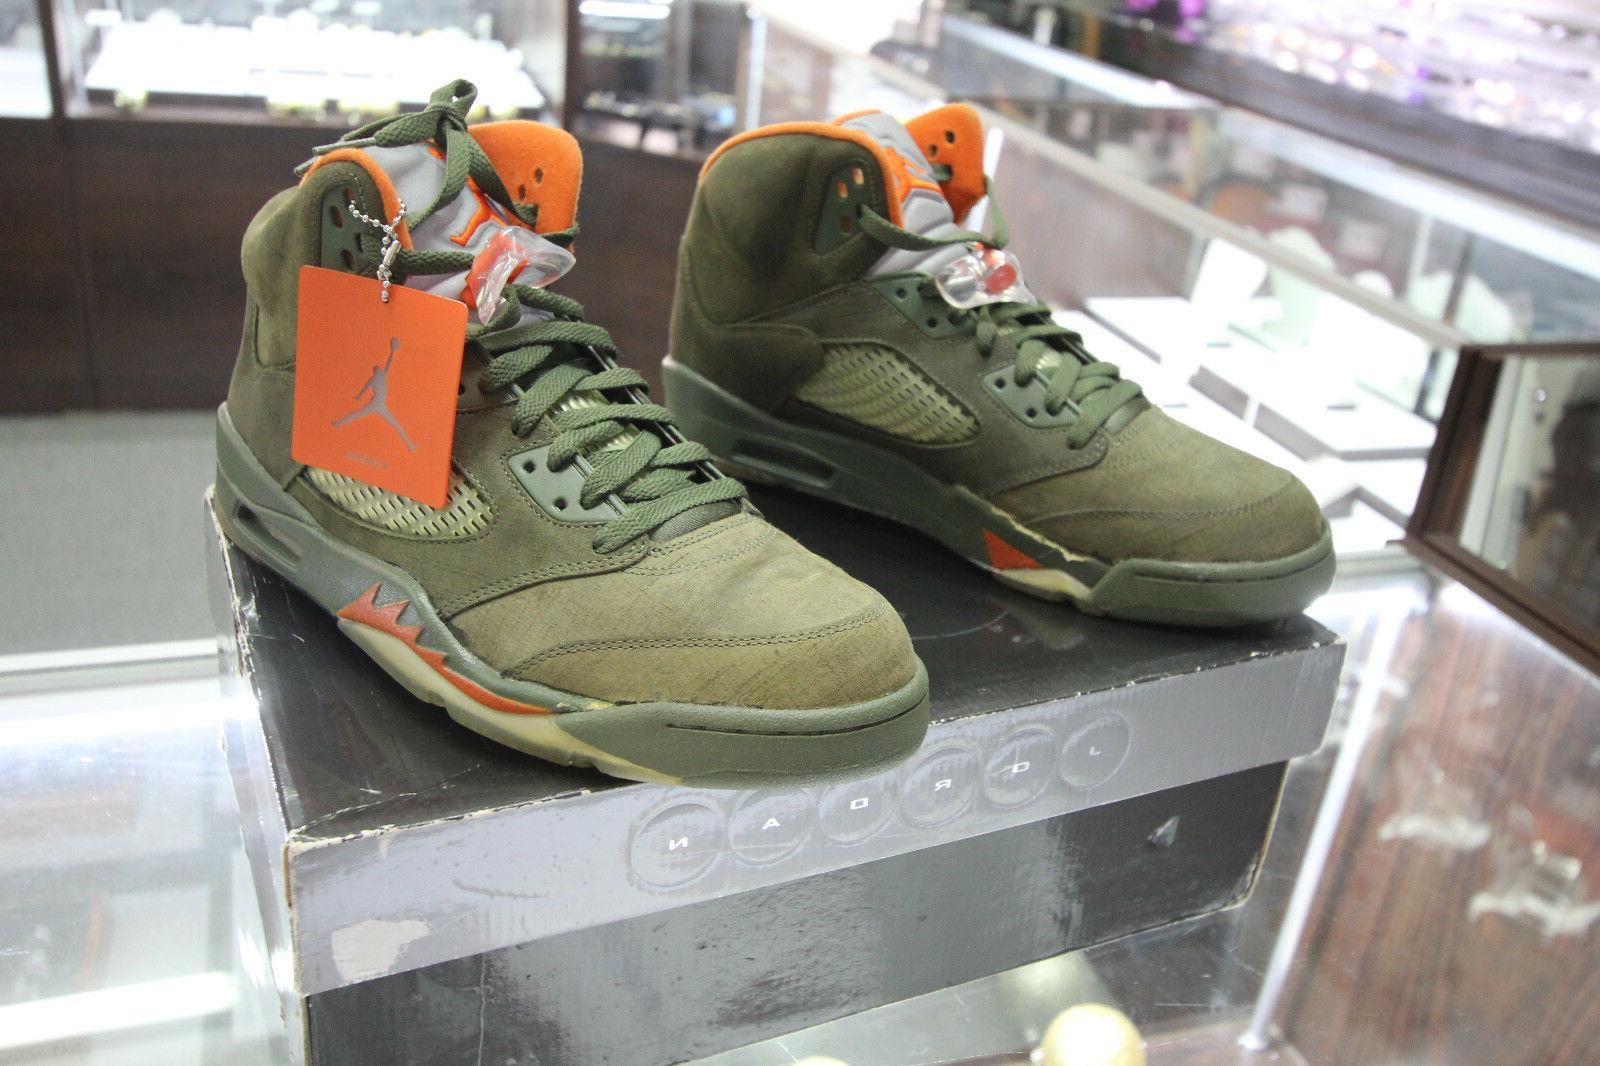 Nike Air Jordan V 5 Retro Army Olive Basketball Shoes VTG 20